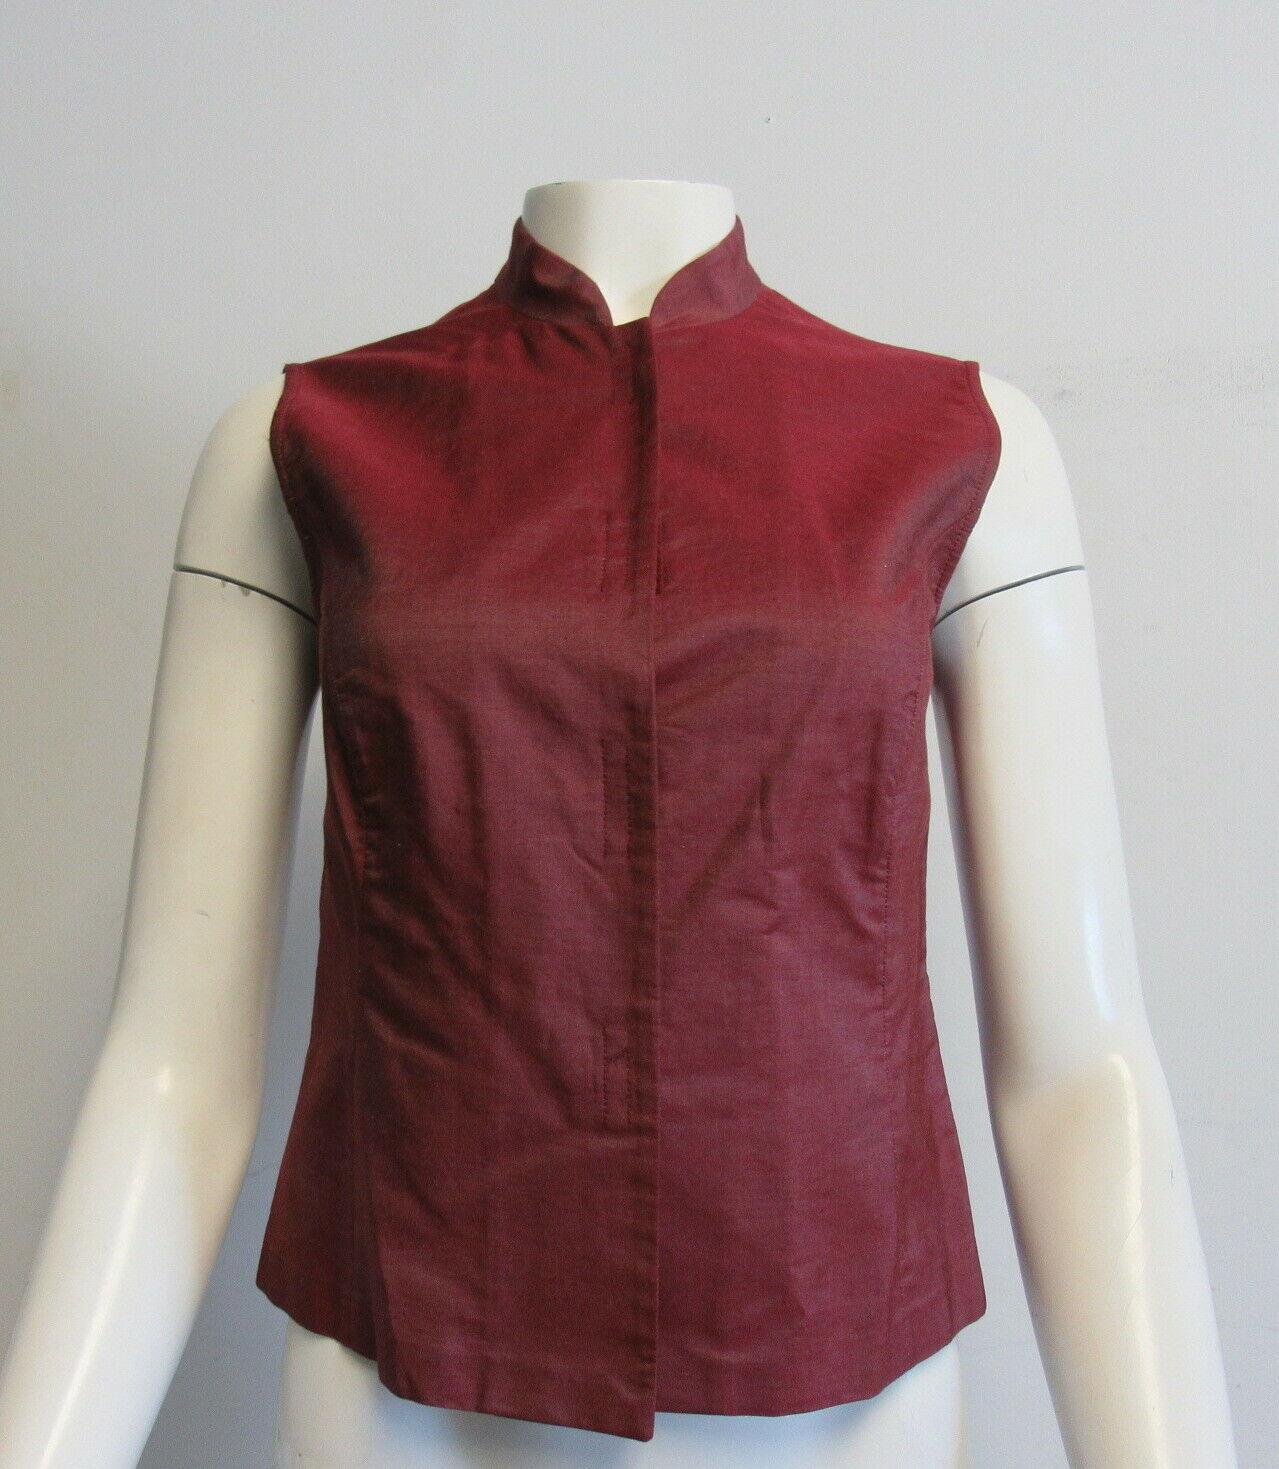 PRADA iridescent maroon sleeveless top SZ 42